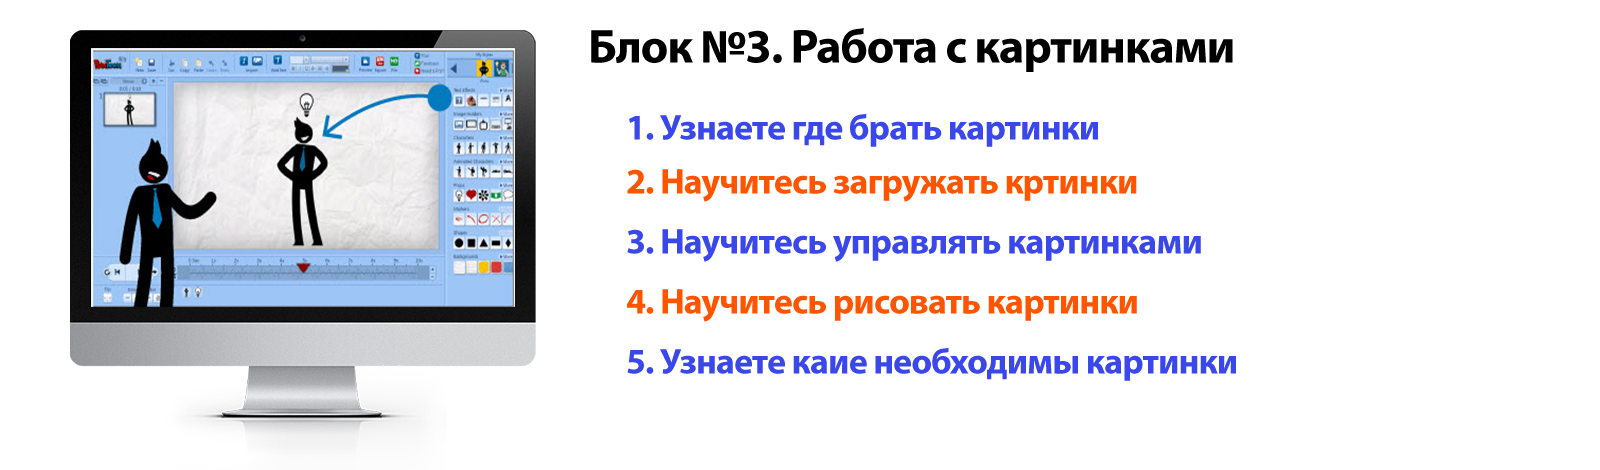 Blok_3_video